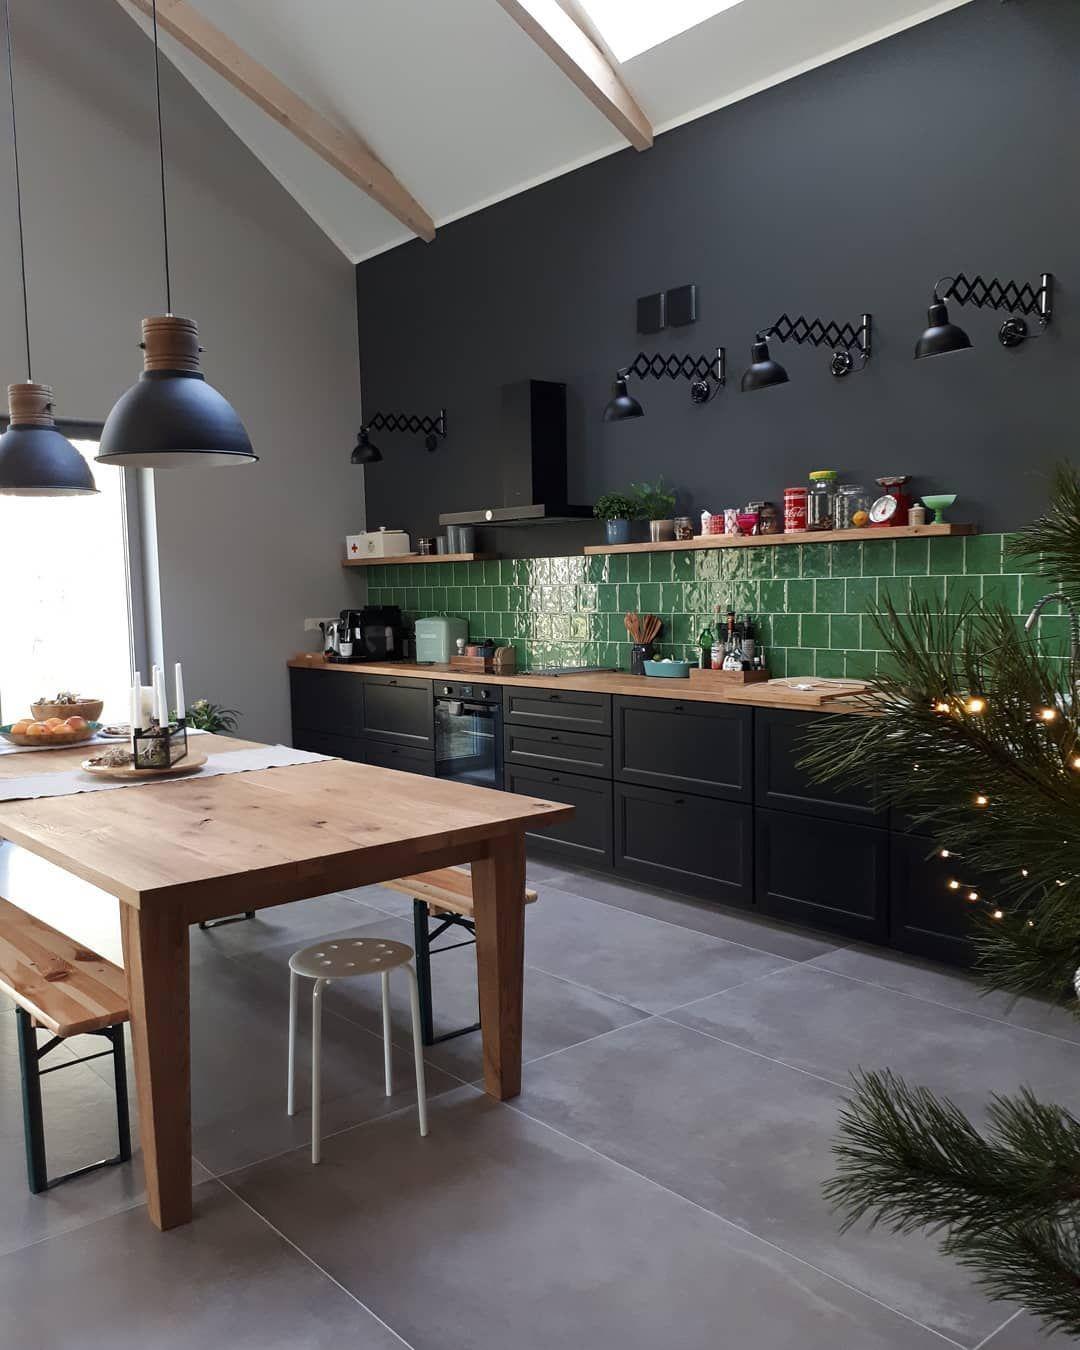 55+ Unexpected Green Kitchen Design Ideas — Trend [2020] в